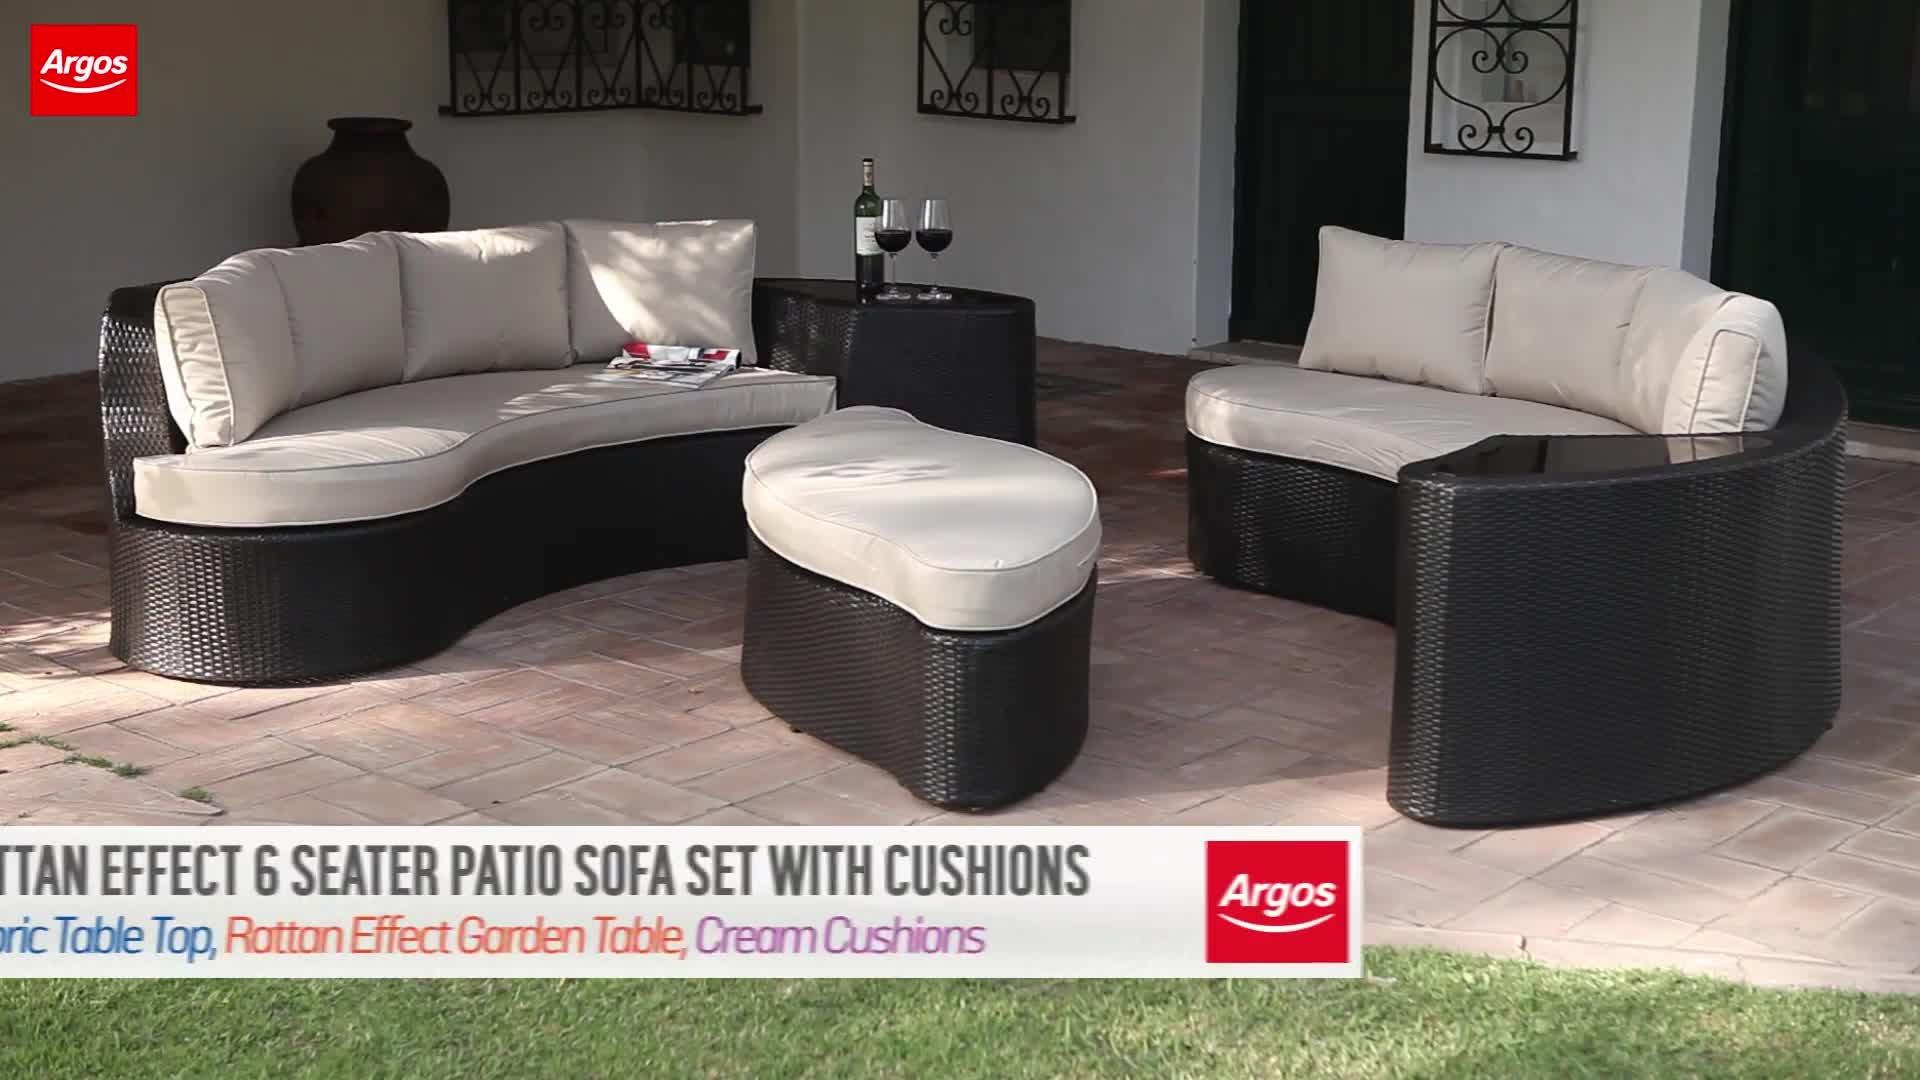 buy argos home 6 seater rattan effect sofa set garden table and rh argos co uk